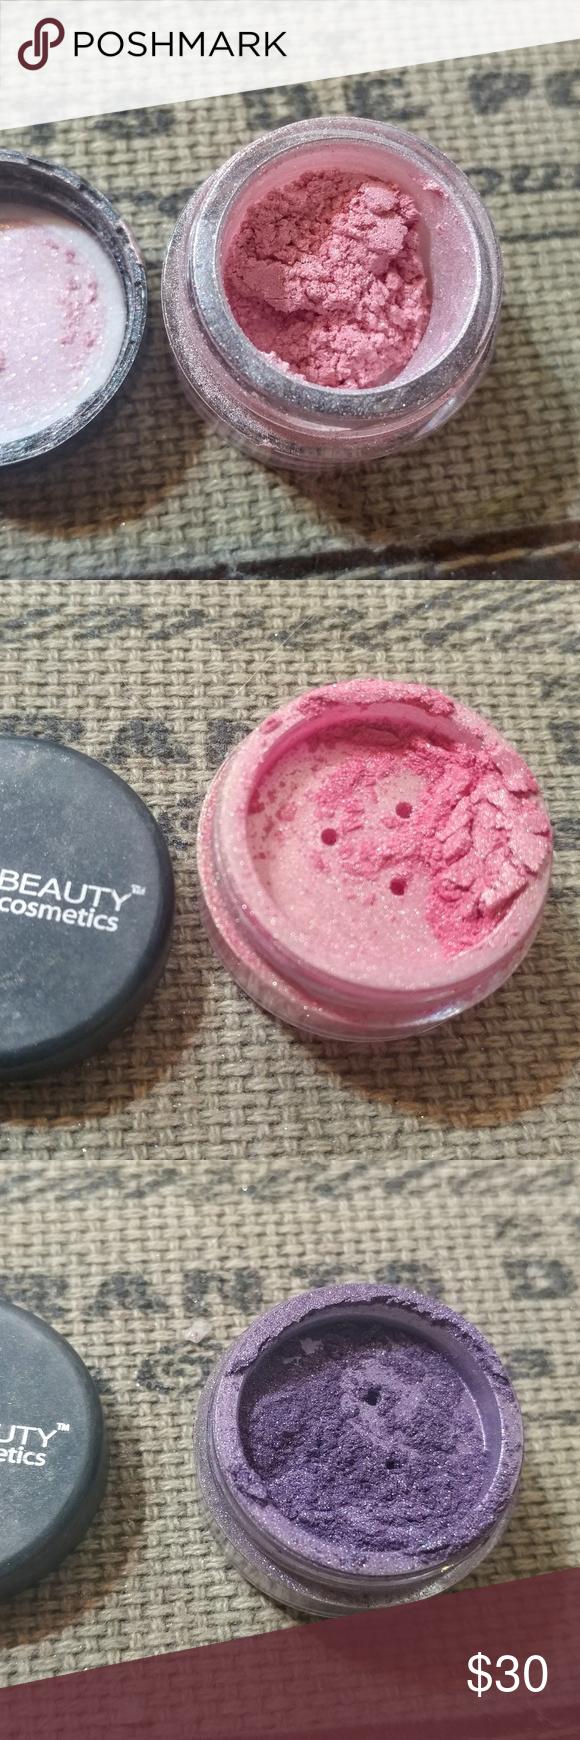 Set of 5 loose eyeshadow, amazing brands! Two Mica Beauty